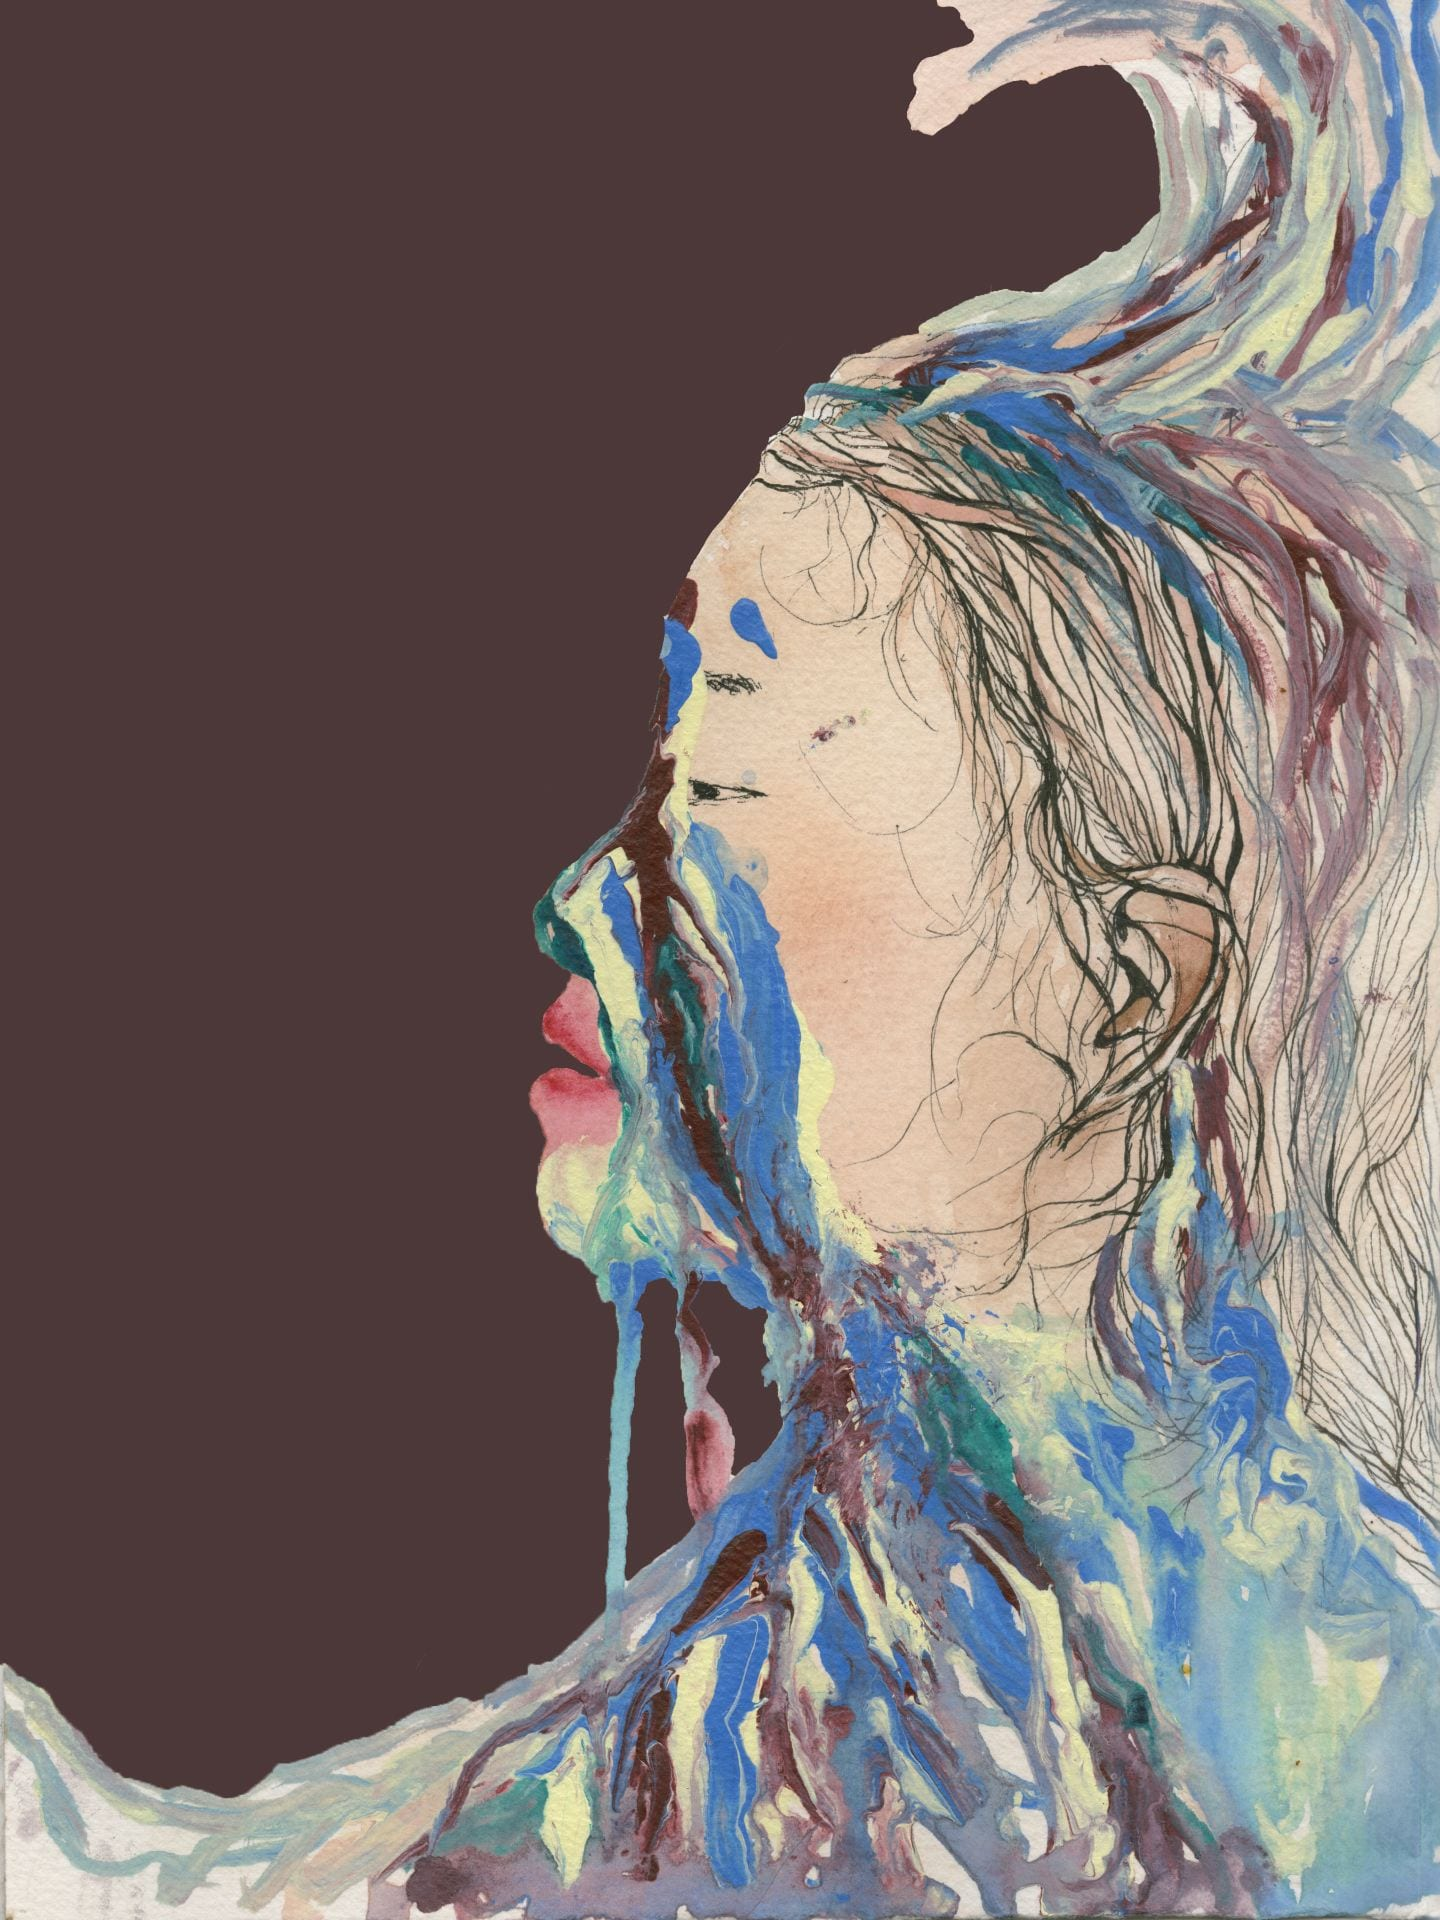 Drawing/Imaging – Week 11: Narrative Self Portrait